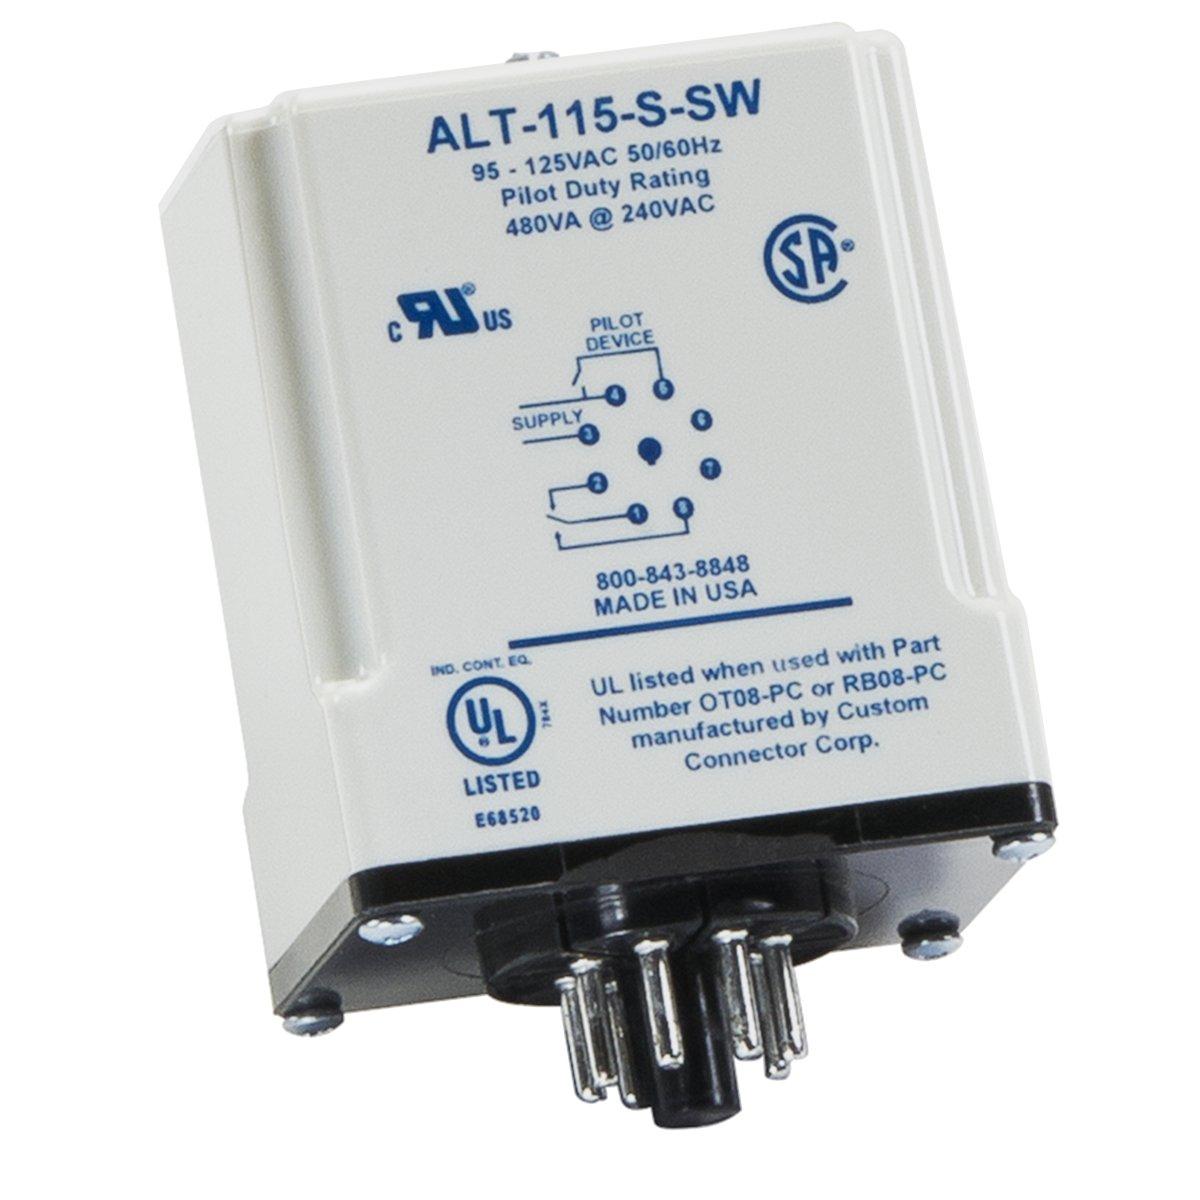 SymCom MotorSaver Alternating Relay with Switch, Model ALT115-S-SW, 95-125V, 8-Pin Octal Base